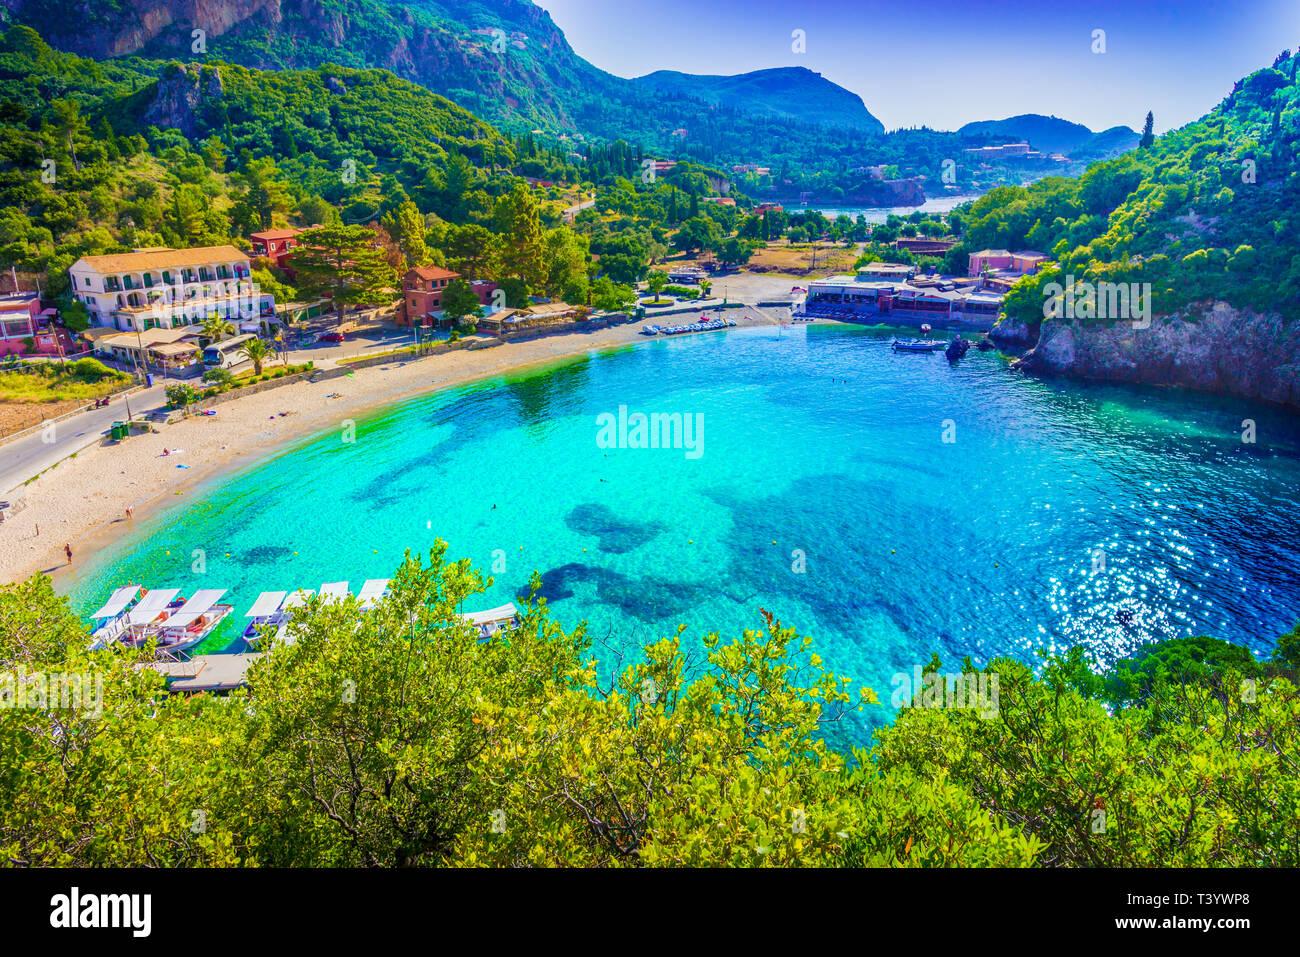 Paleokastritsa beach. Corfu islands, Greece. - Stock Image